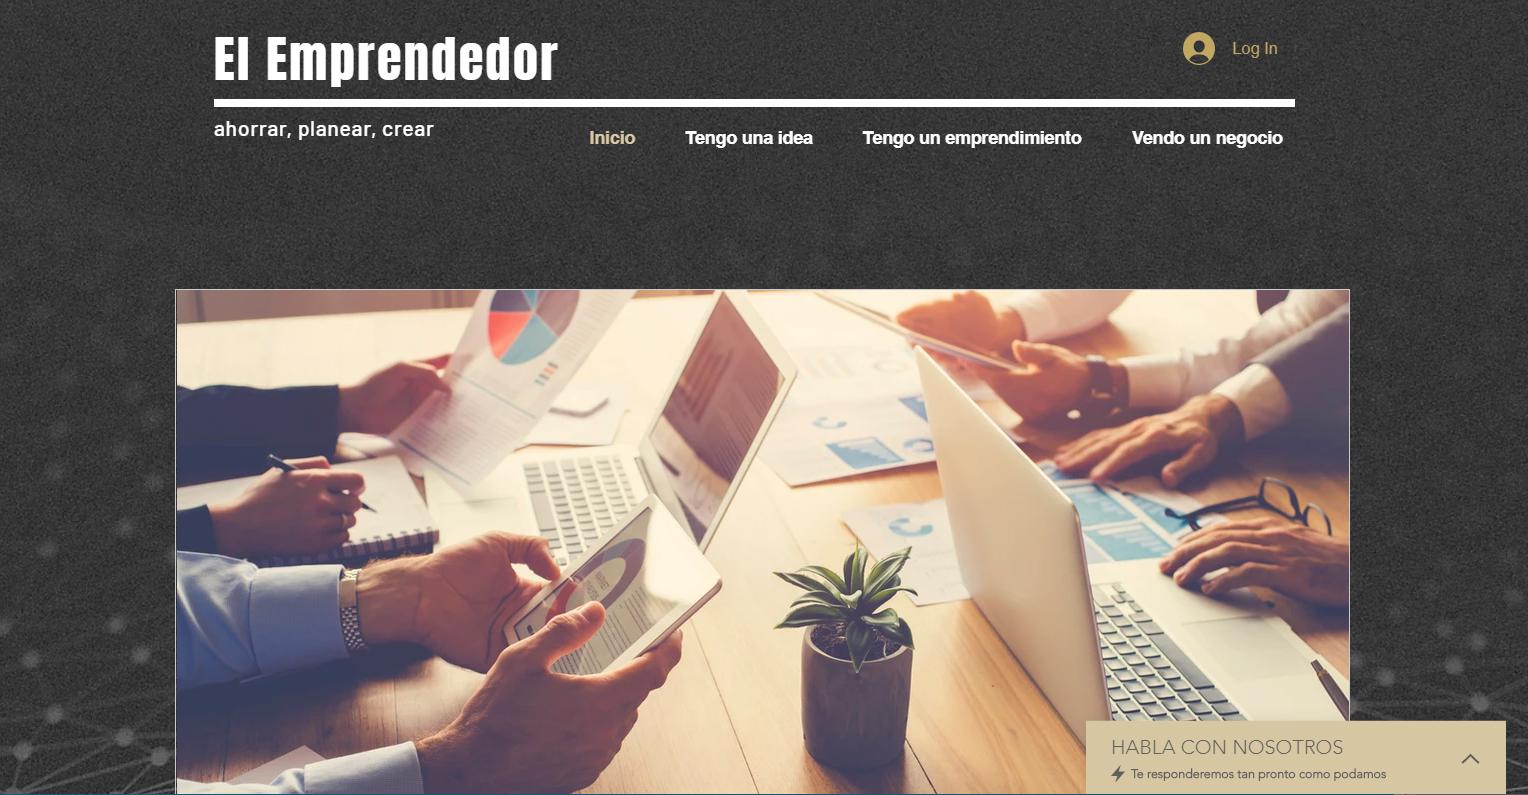 EL EMPRENDEDOR | PARAGUAY